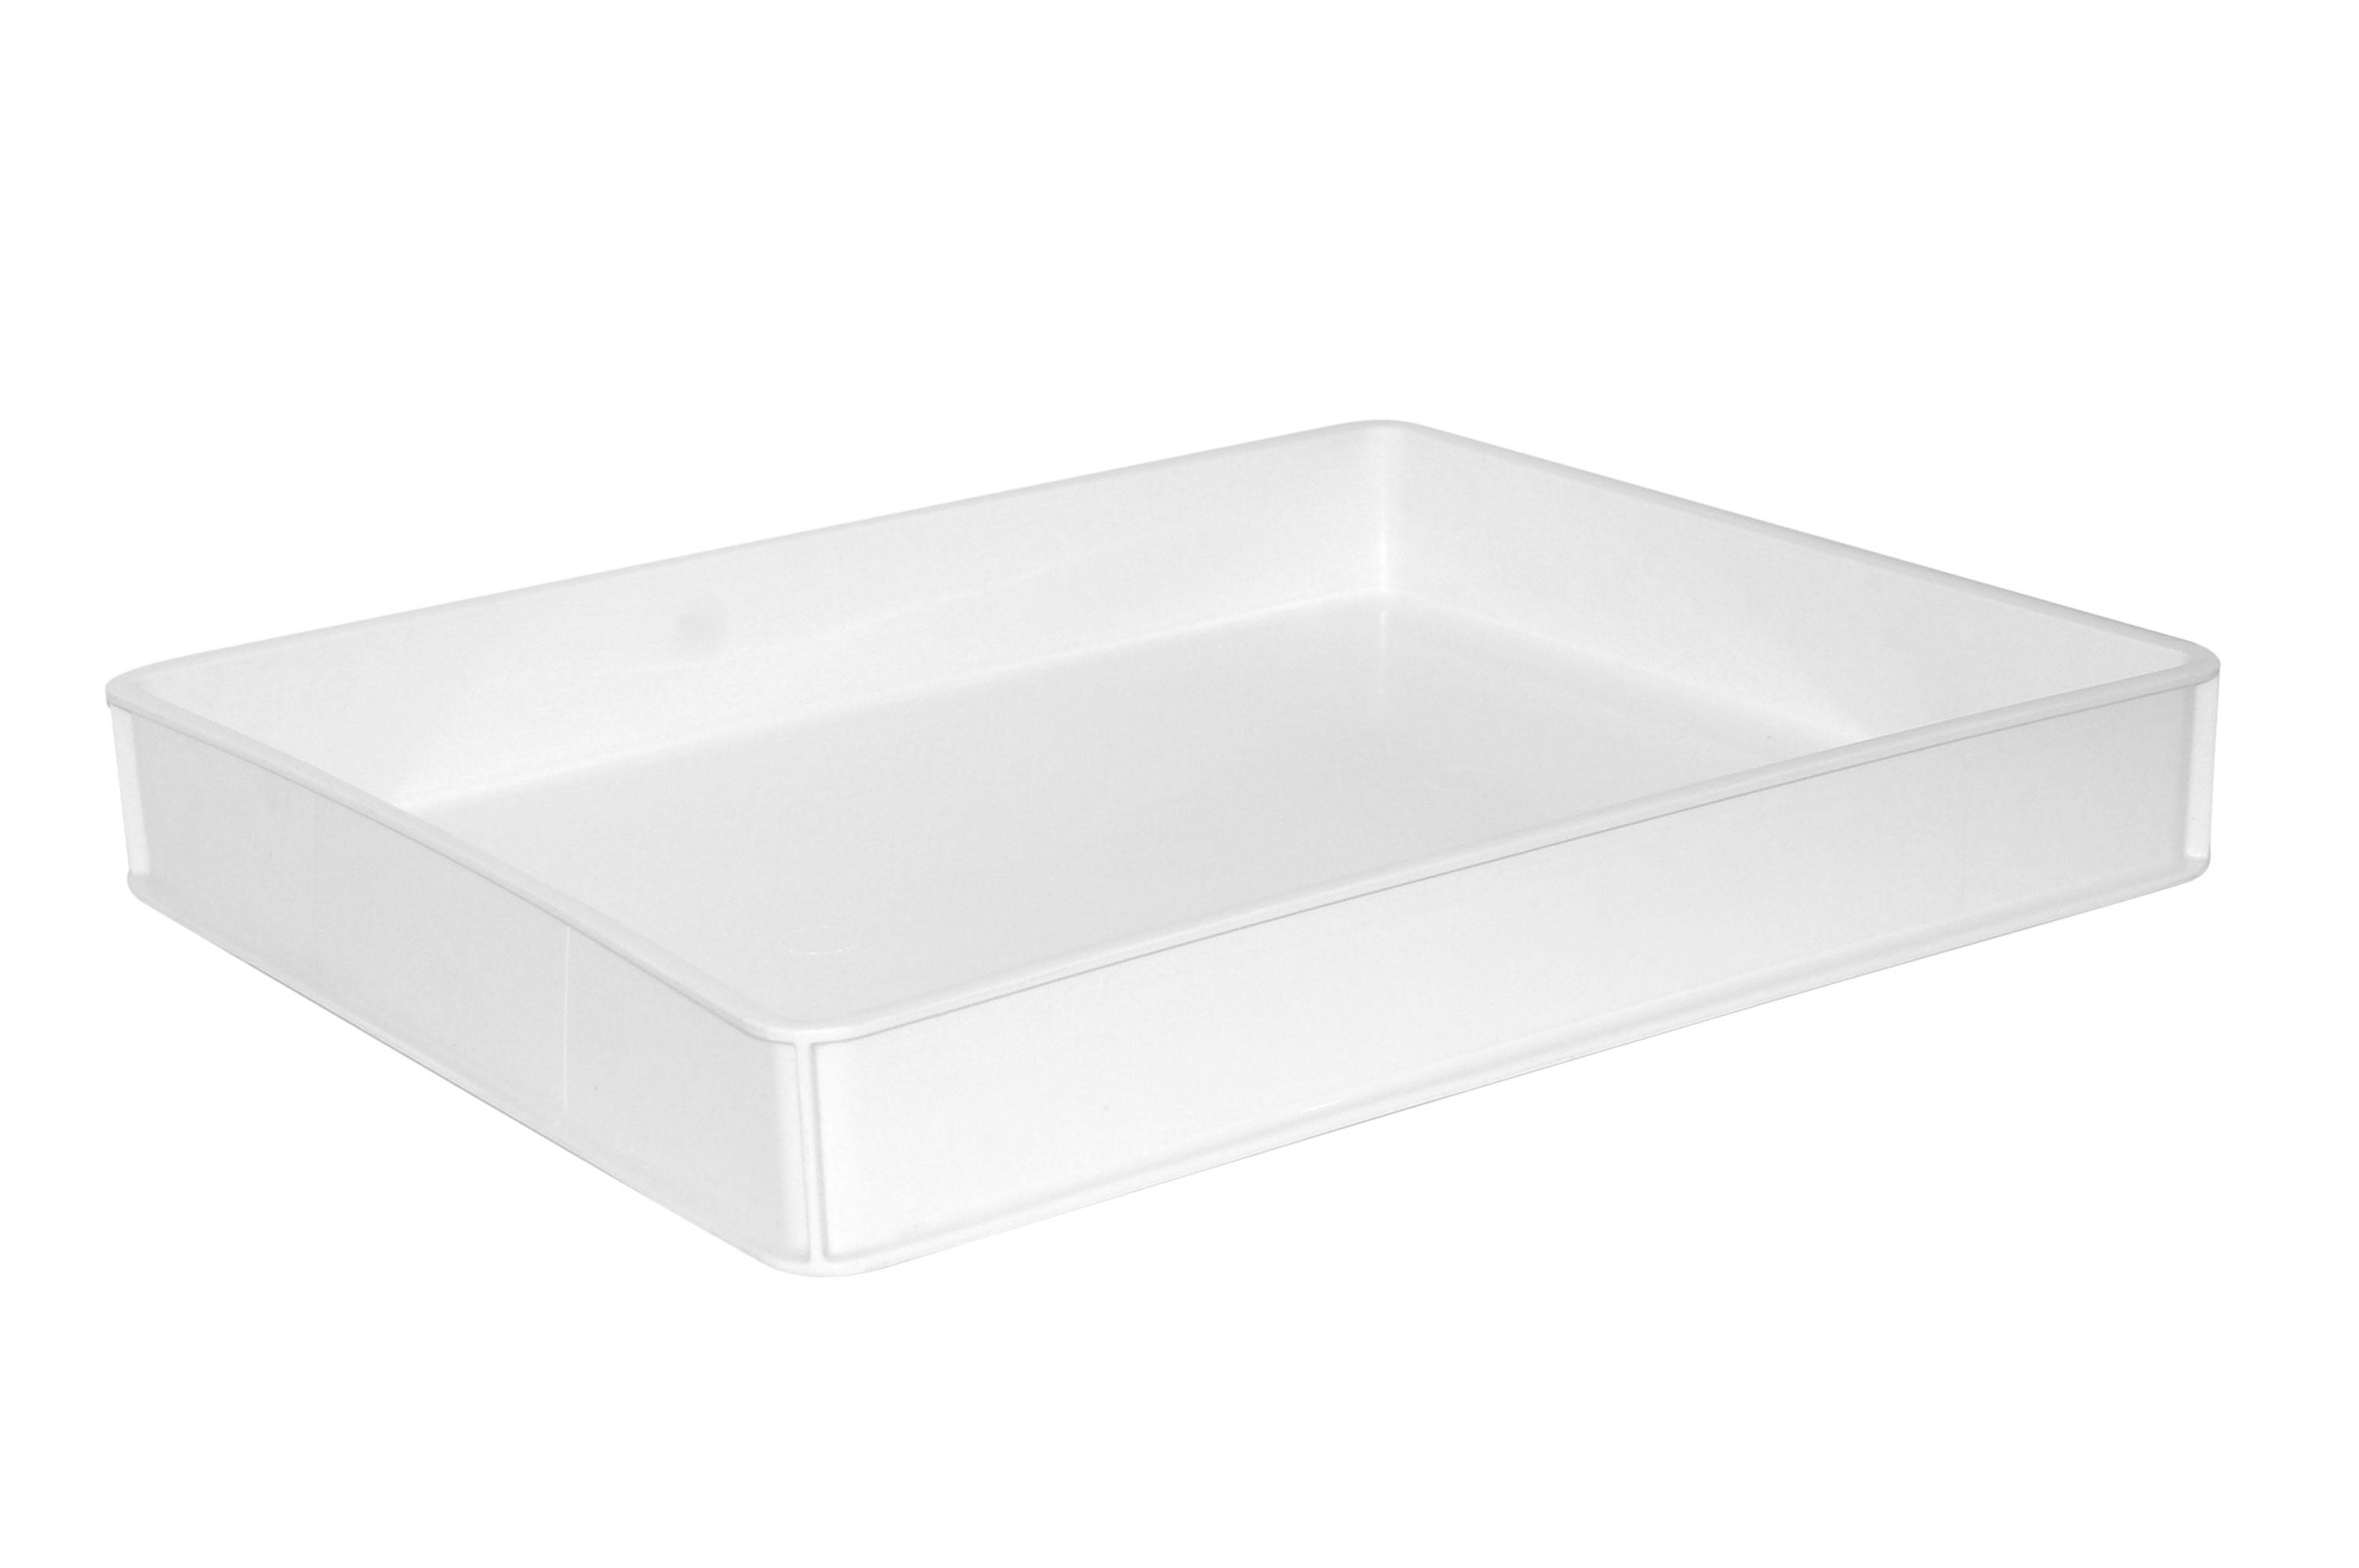 MULTIPURPOSE PLASTIC TRAY - 540 x 435 x 70mm